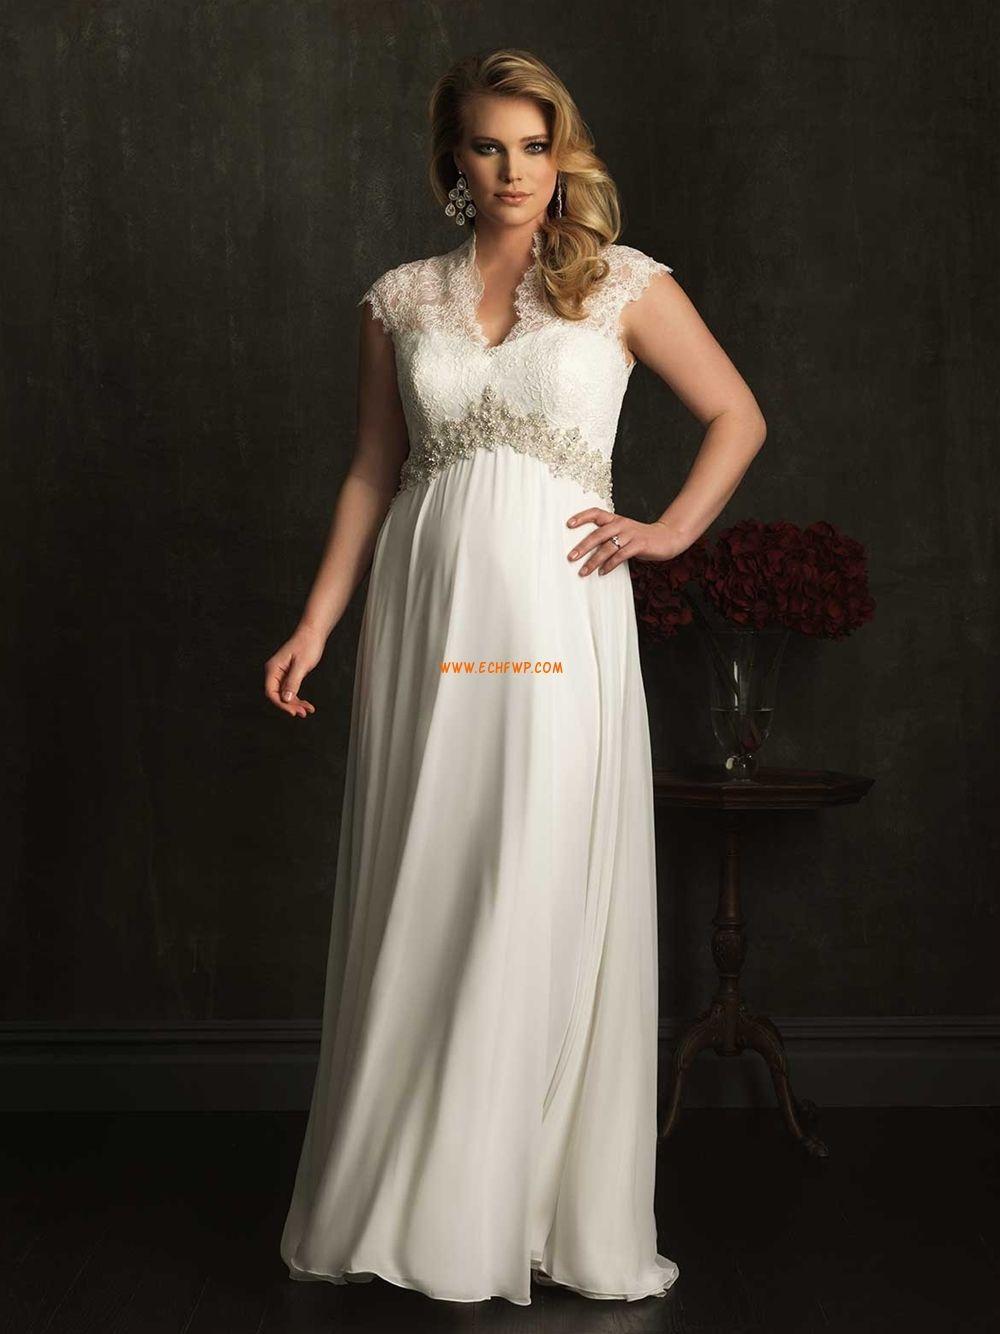 Iglesia cola corte cristal detallando vestidos de novia